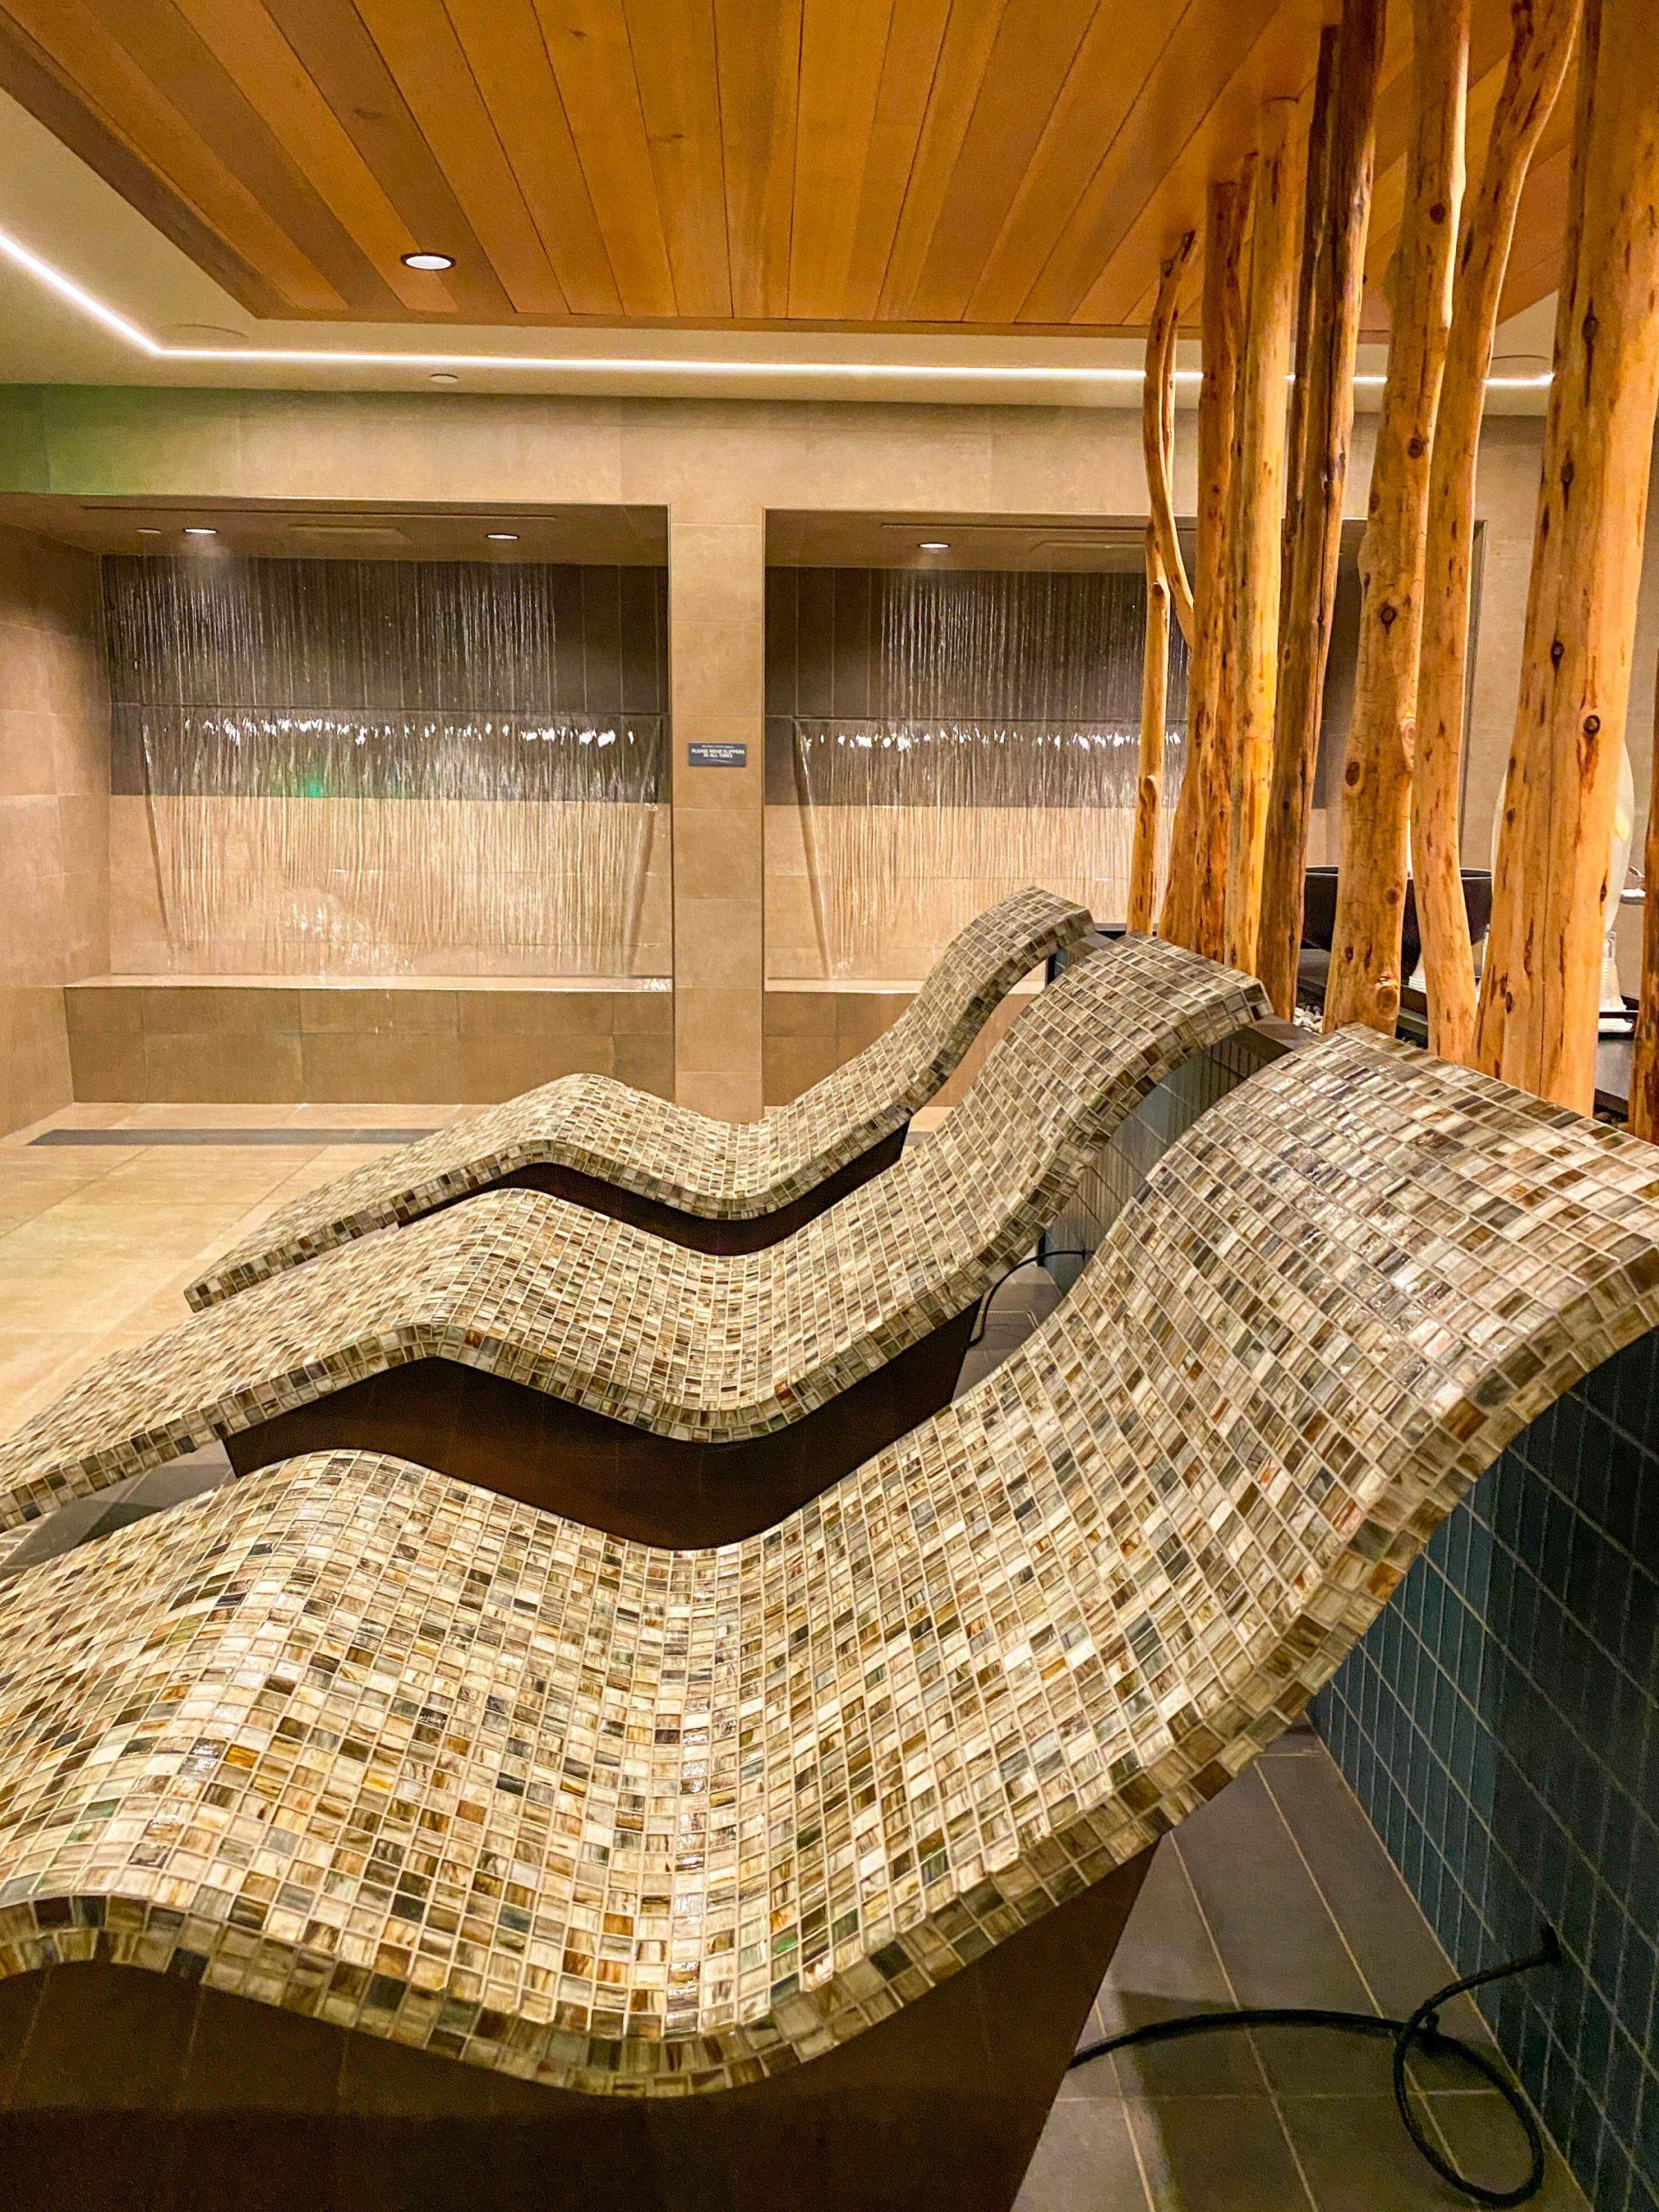 The interior of Rush Creek Spa